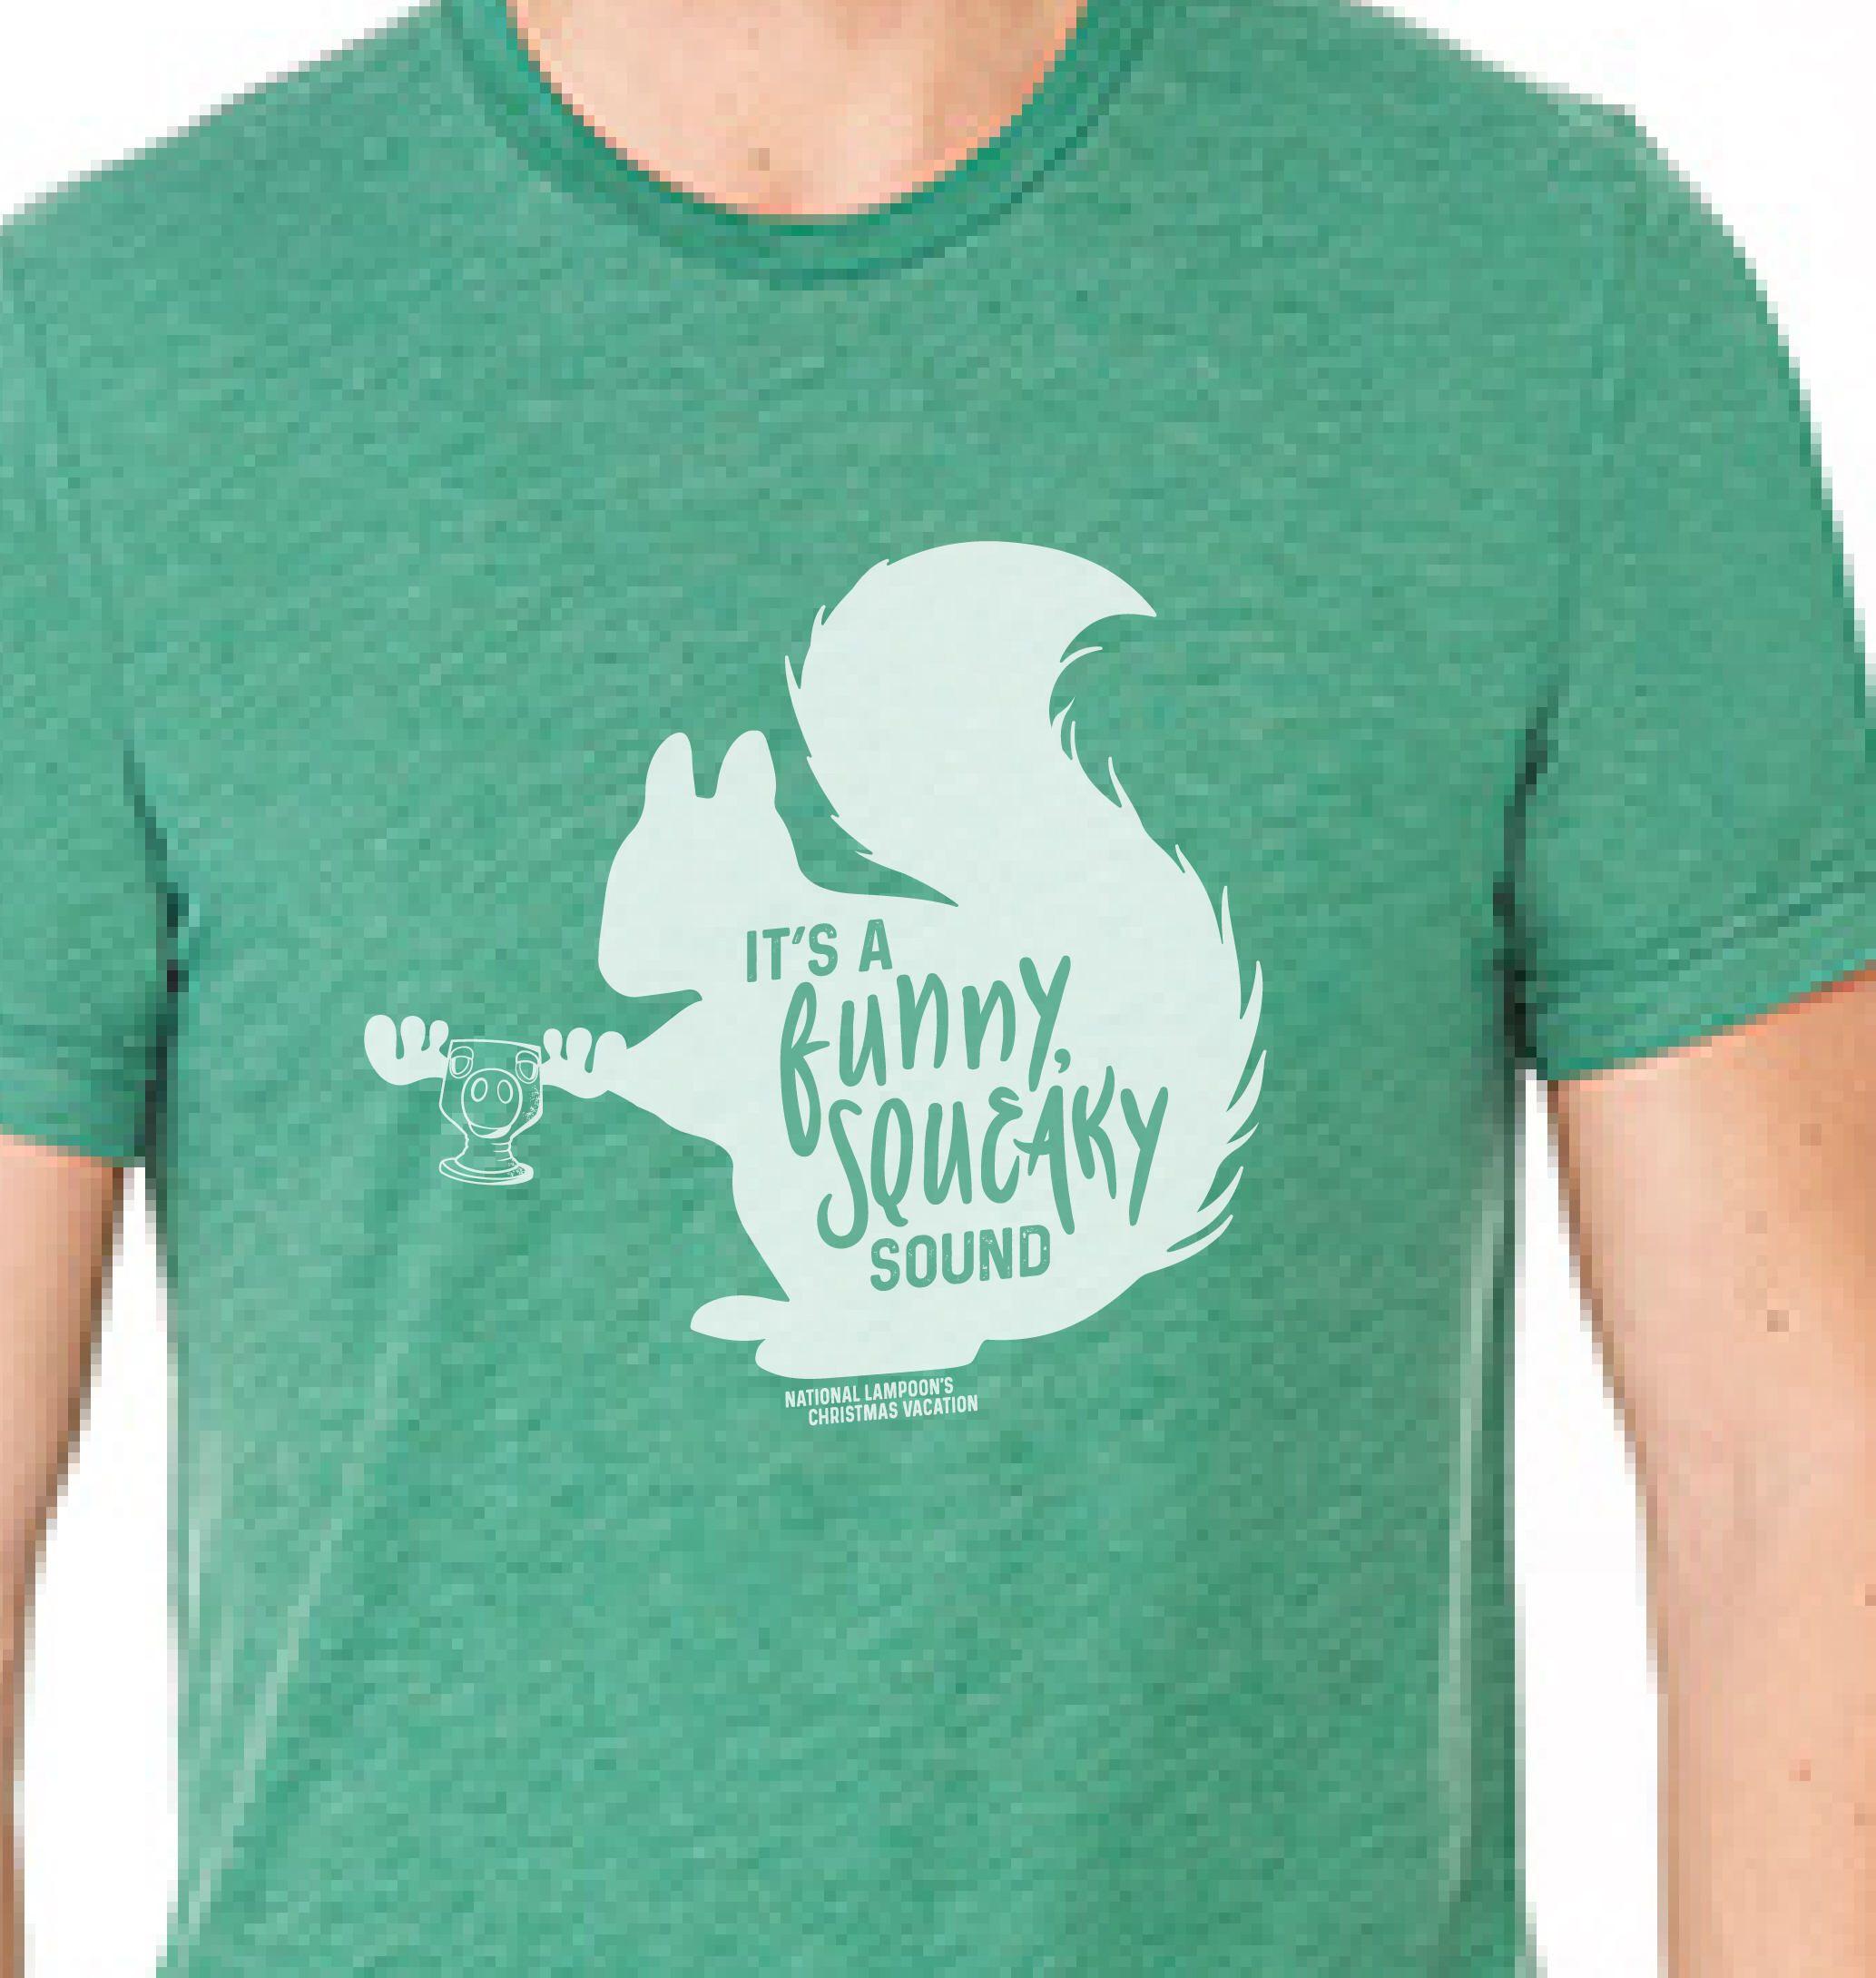 Funny Shirt National Lampoons Christmas Vacation Squirrel Etsy In 2020 Christmas Vacation Shirts National Lampoons Christmas National Lampoons Christmas Vacation